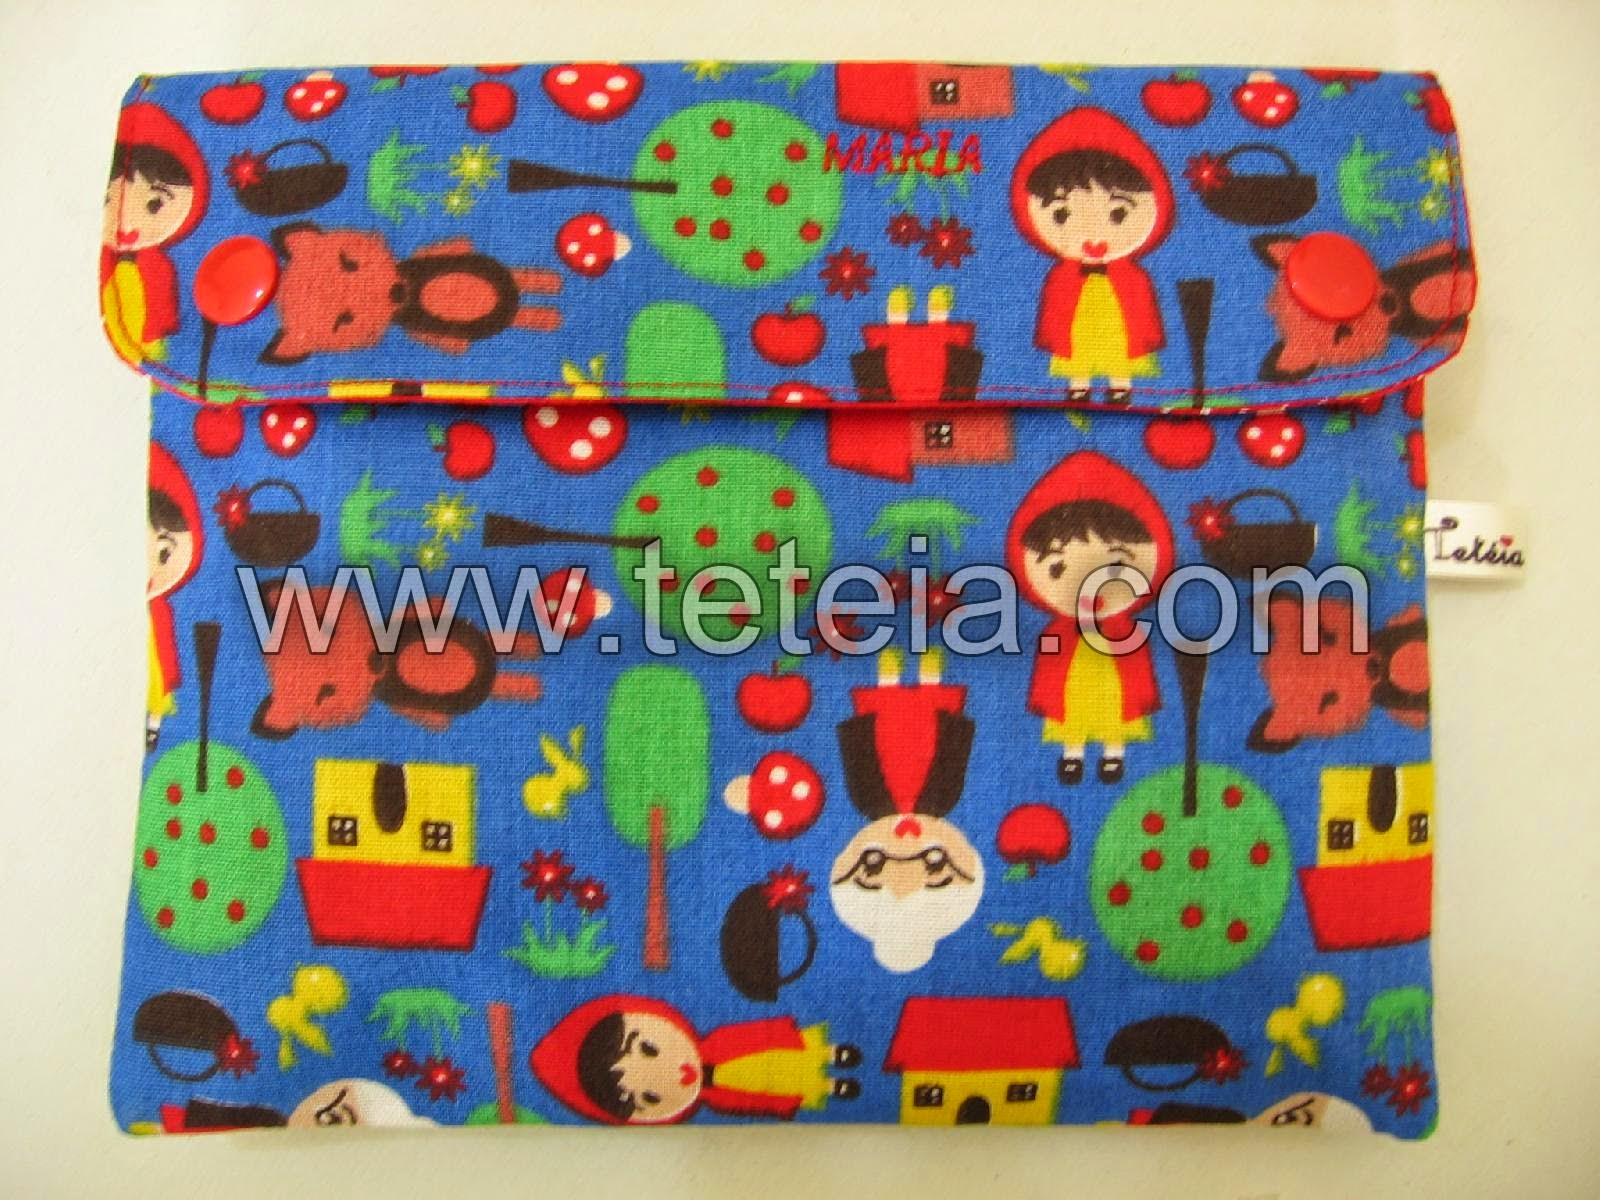 Tetéia Patchwork: Kit de higiene bucal infantil chapeuzinho vermelho  #B1201A 1600x1200